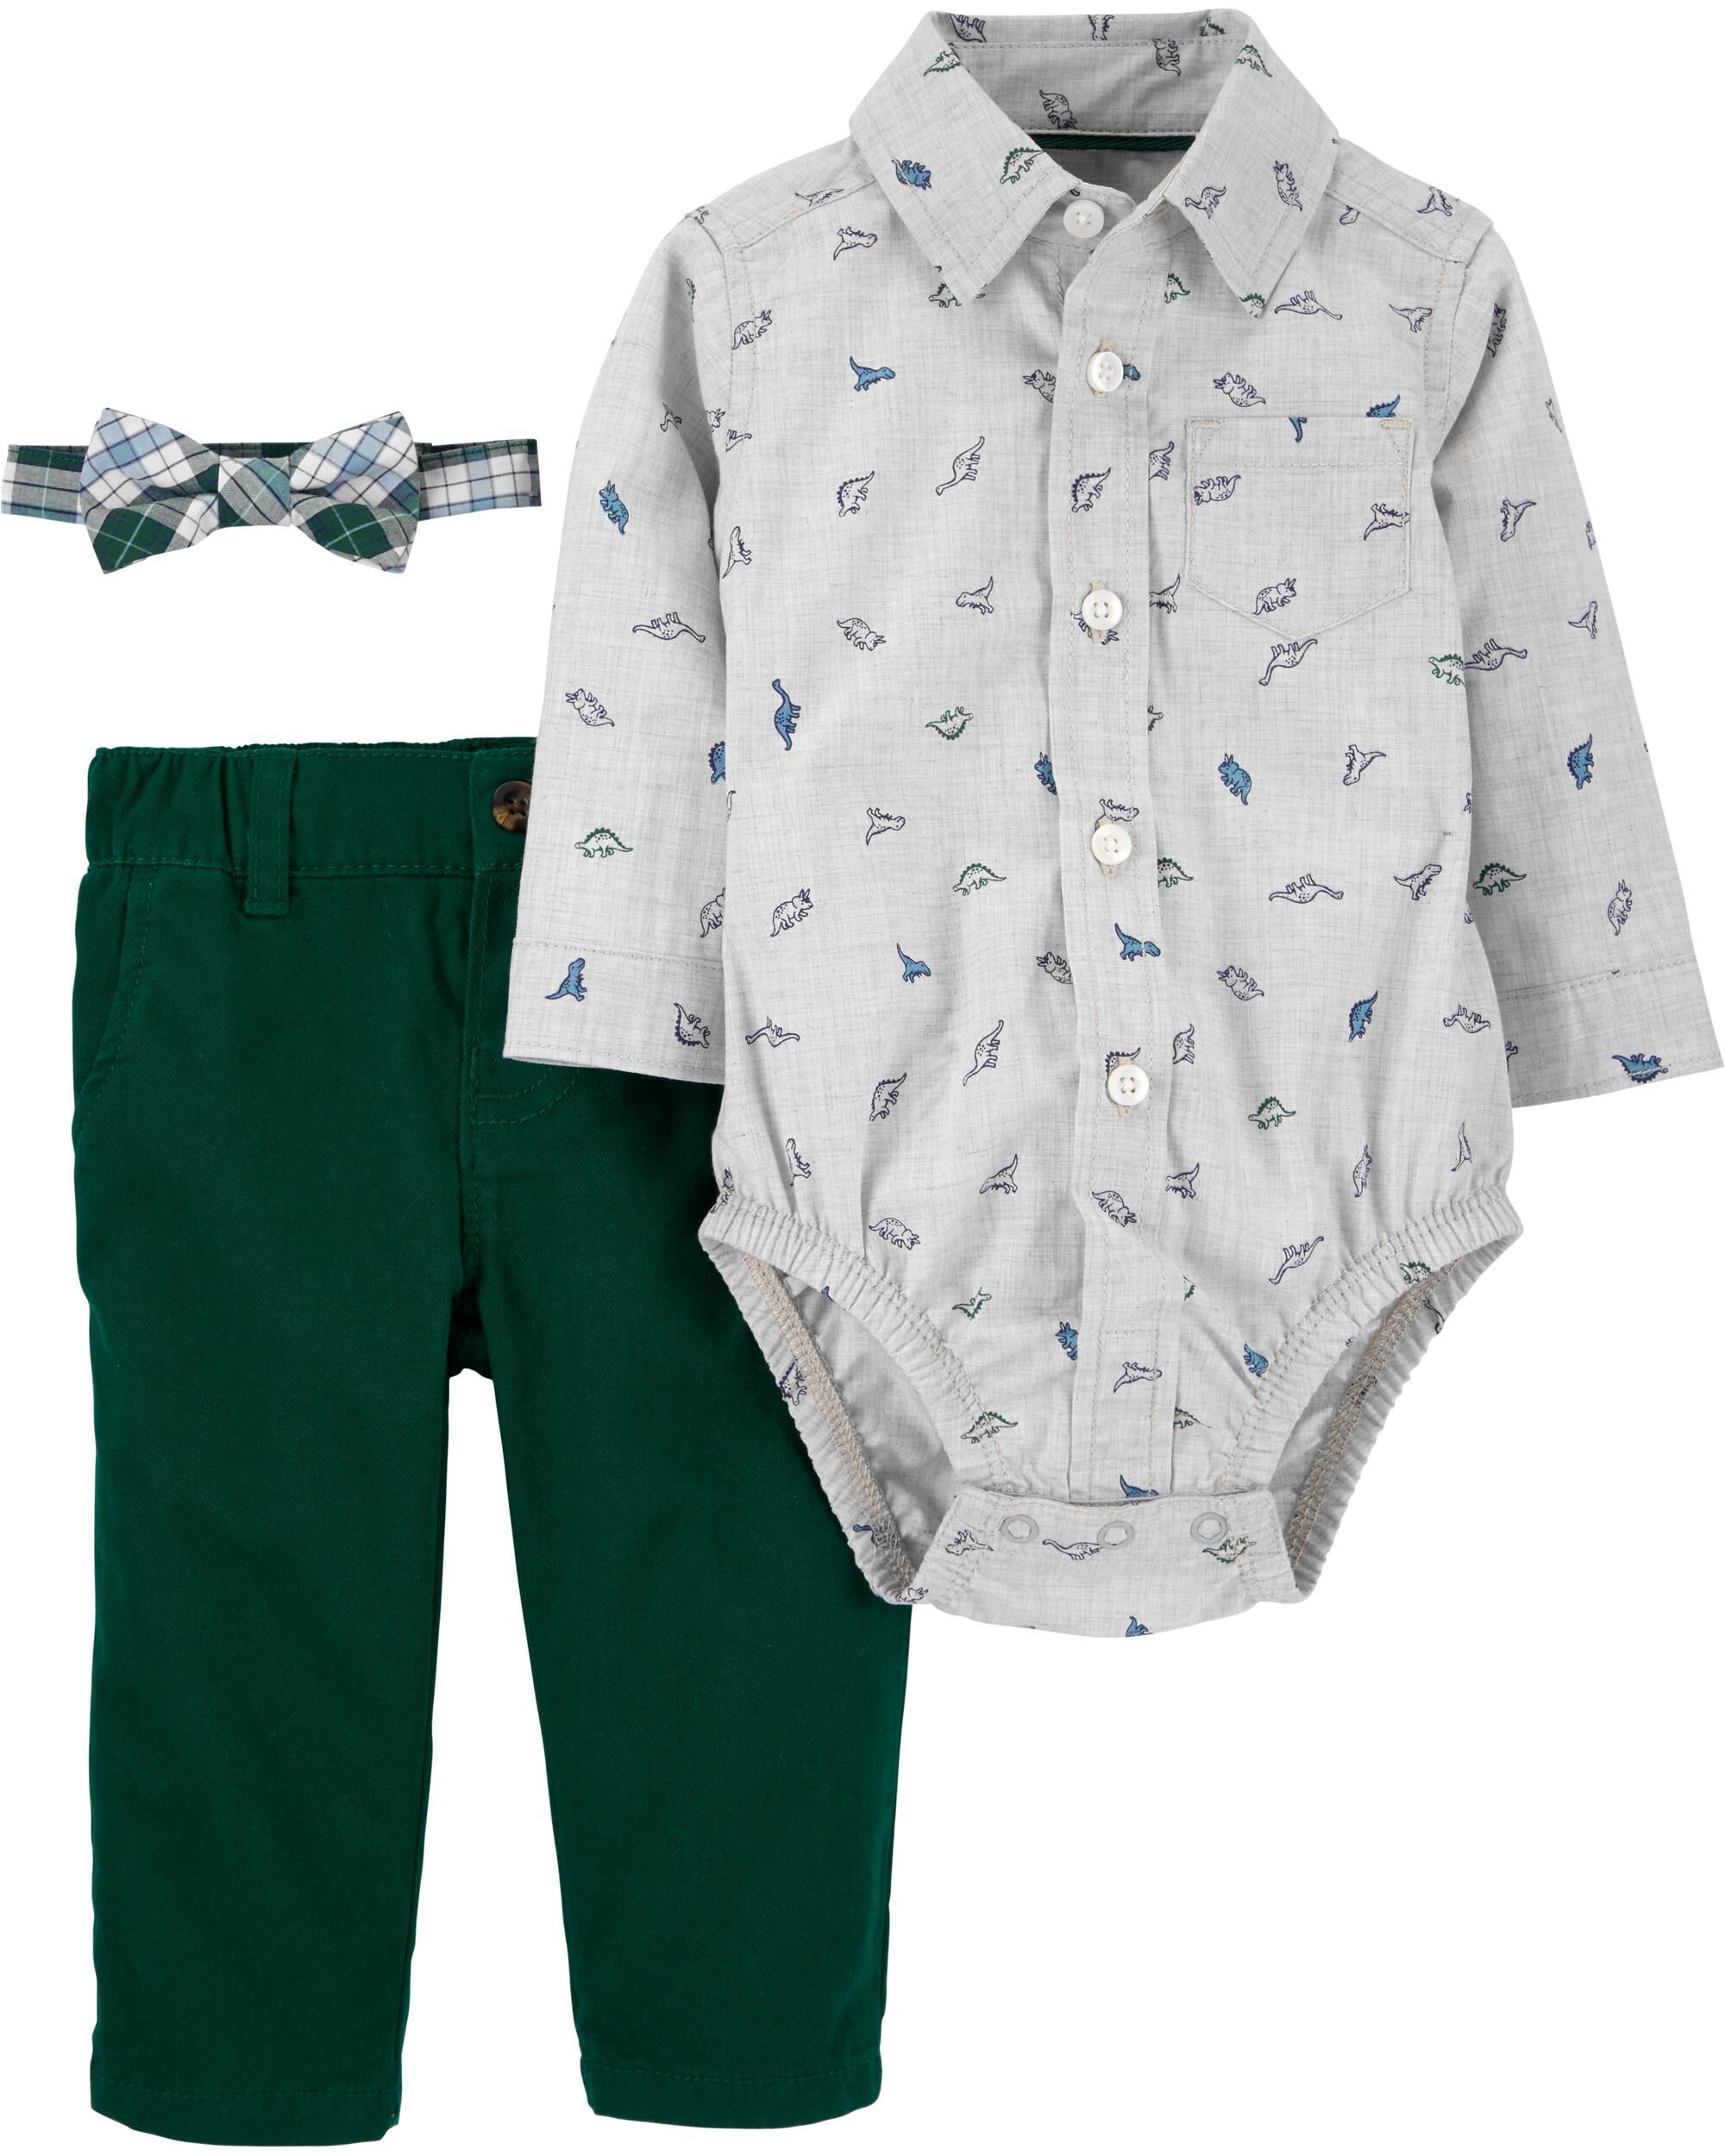 *CLEARANCE* 3-Piece Dinosaur Dress Me Up Set